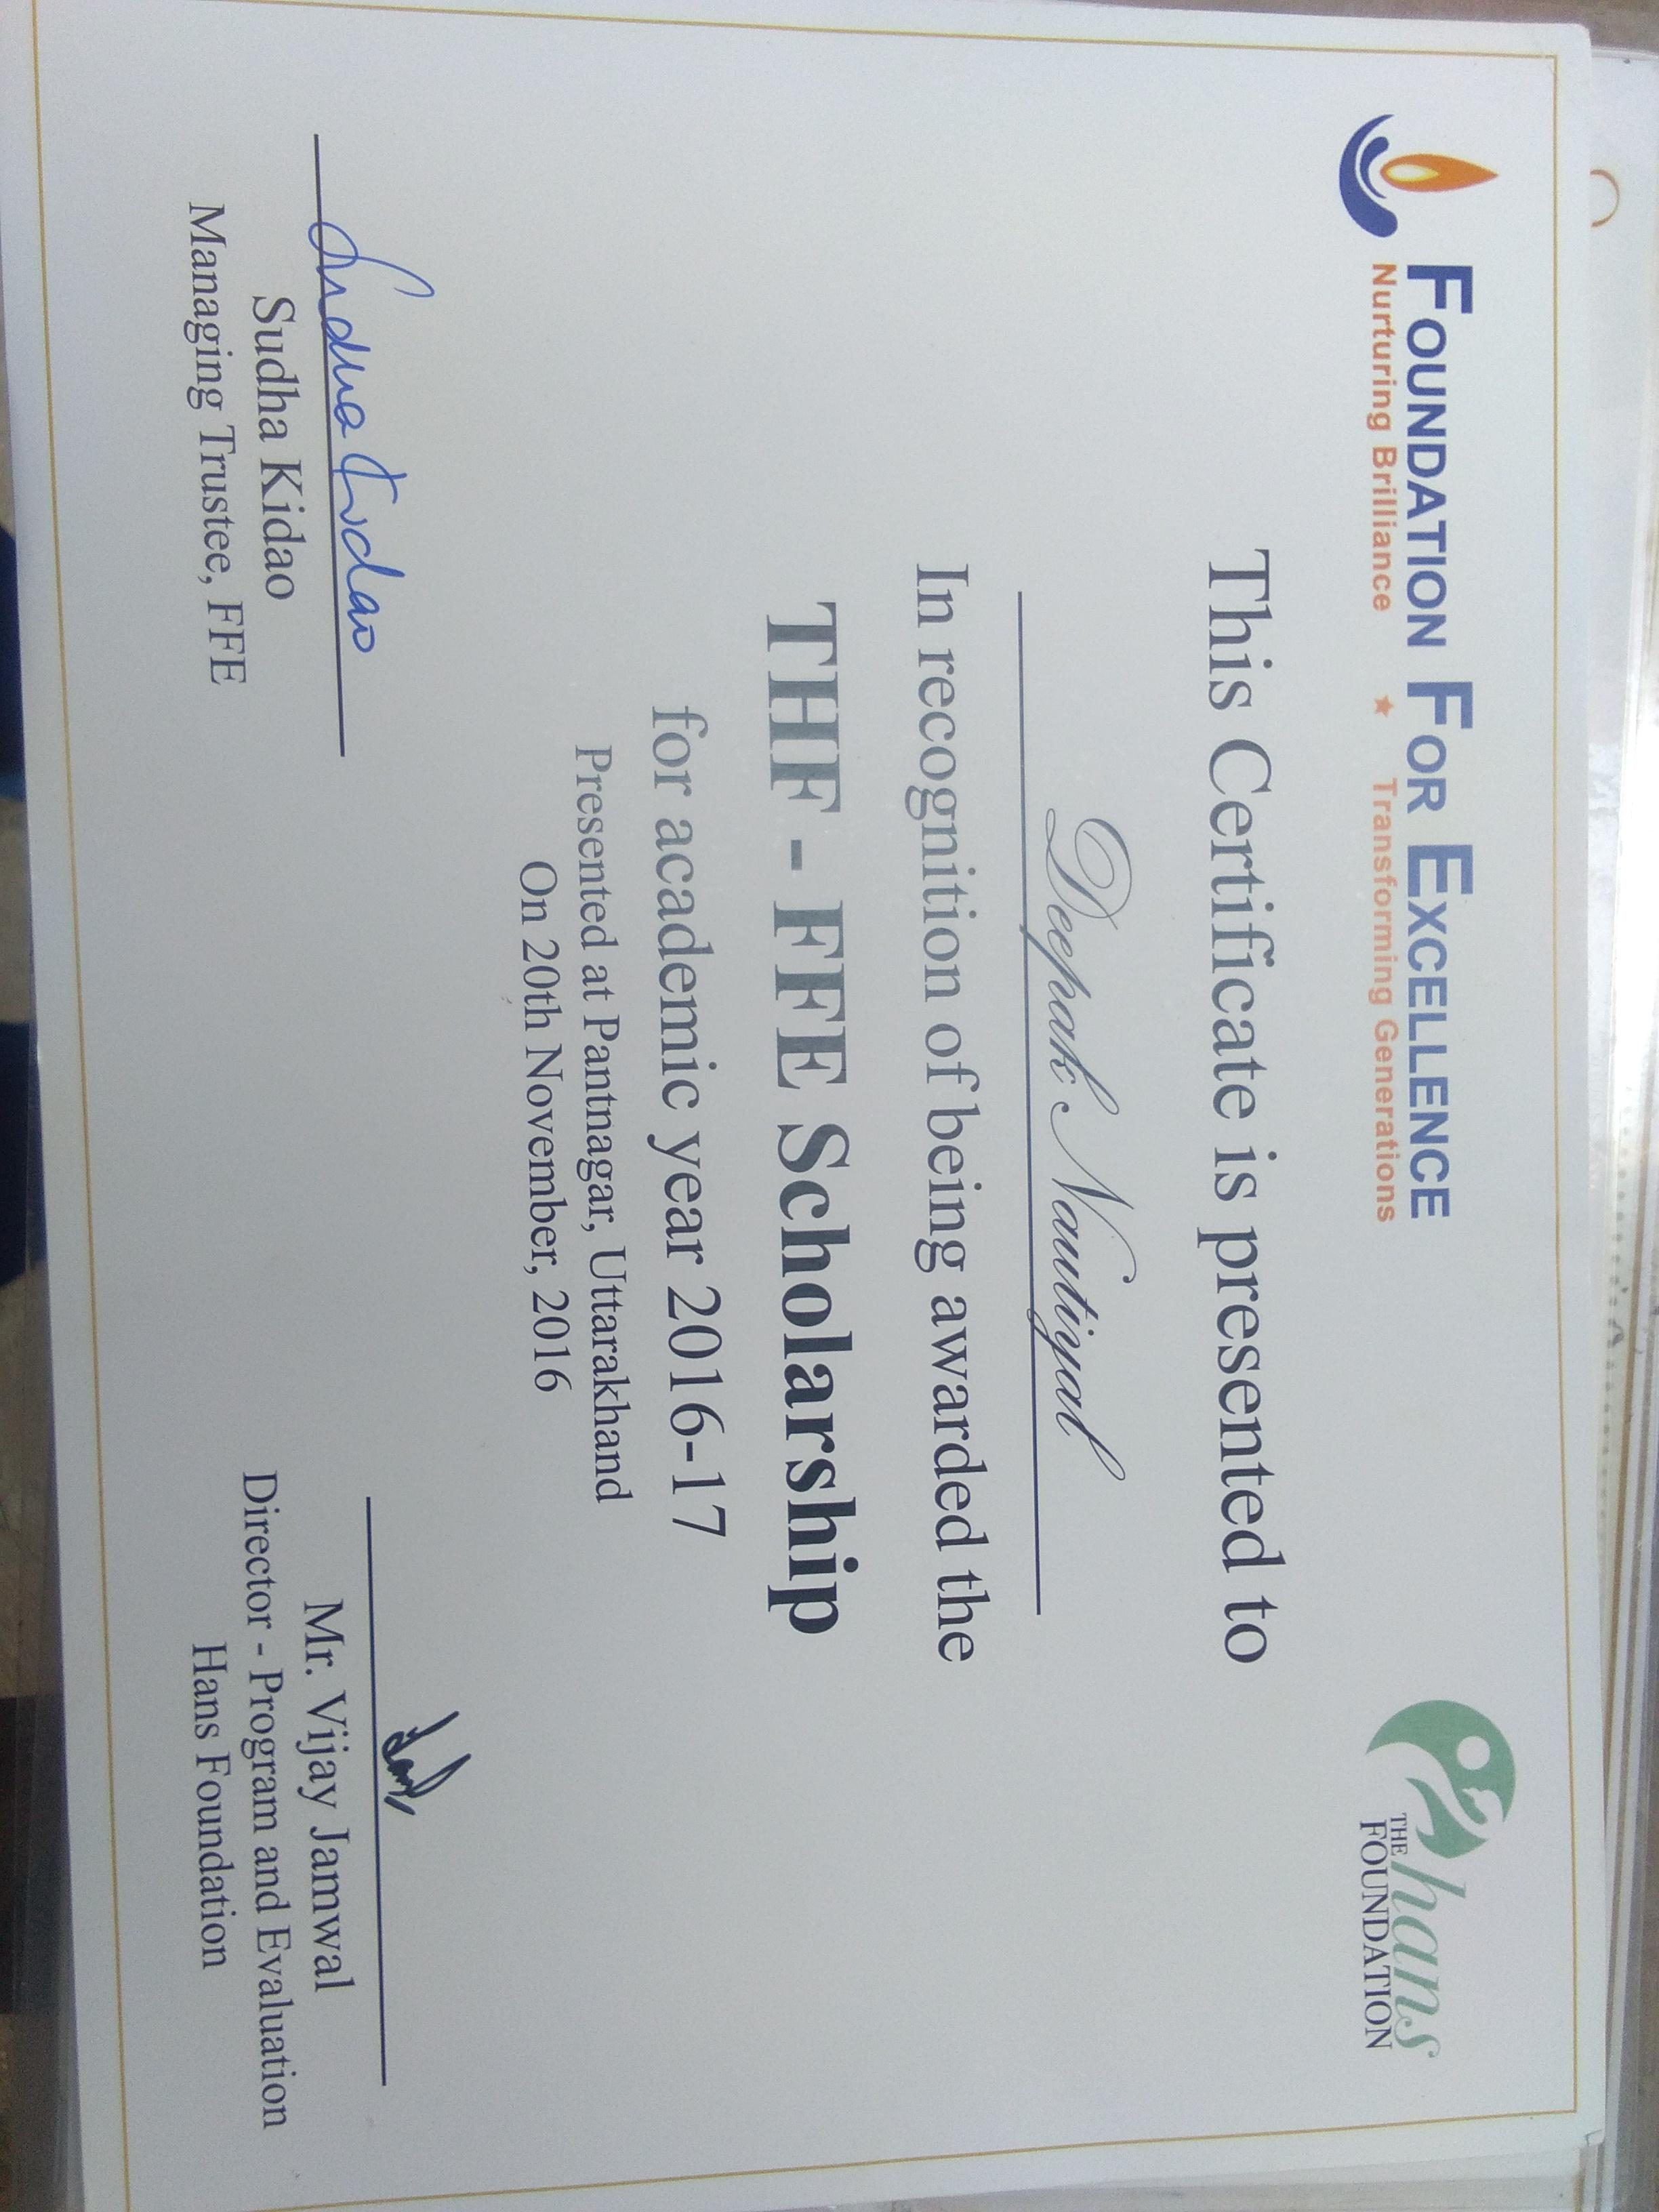 FFE scholarship